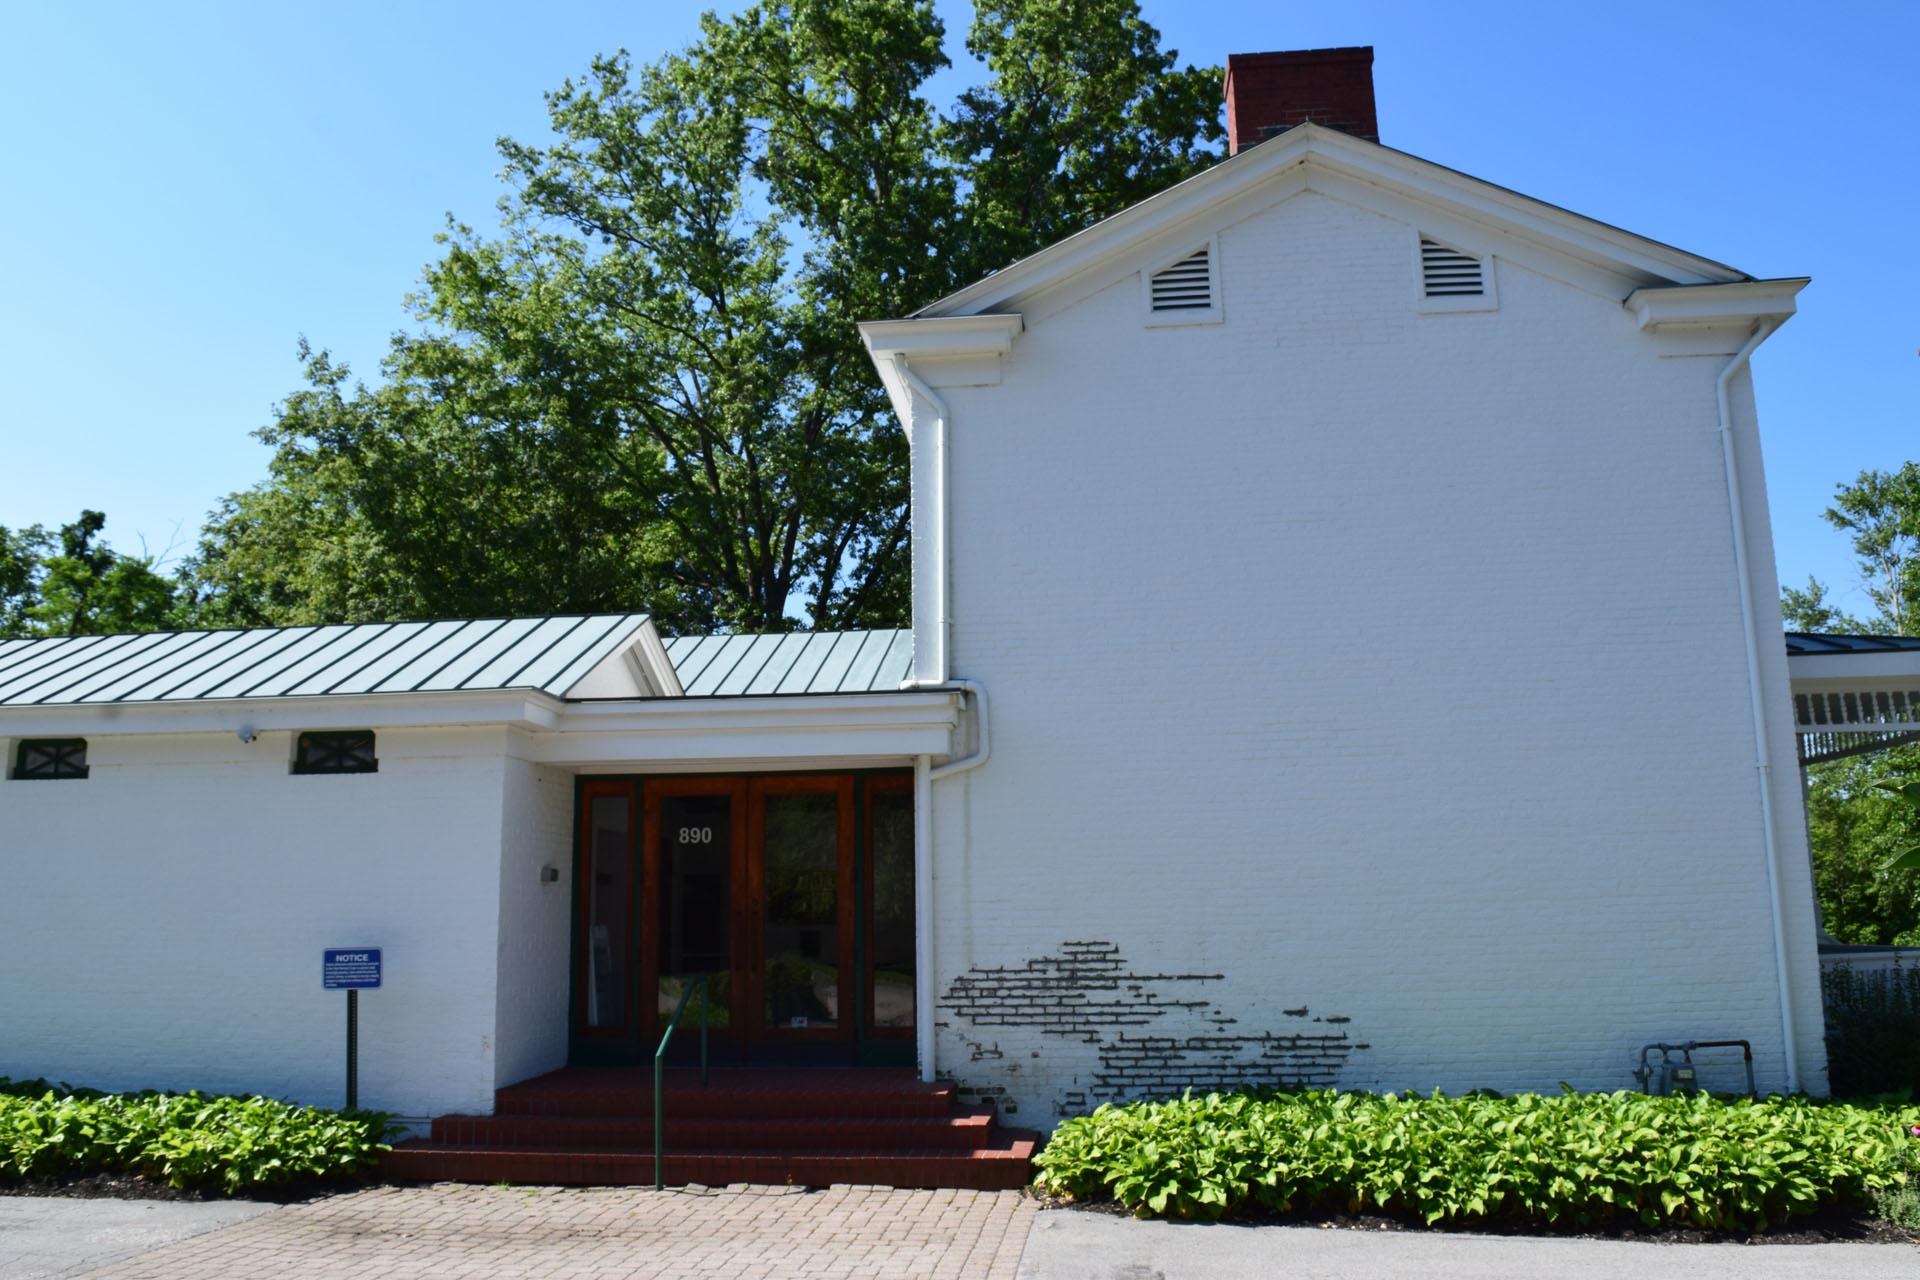 Main Entrance Heritage Center